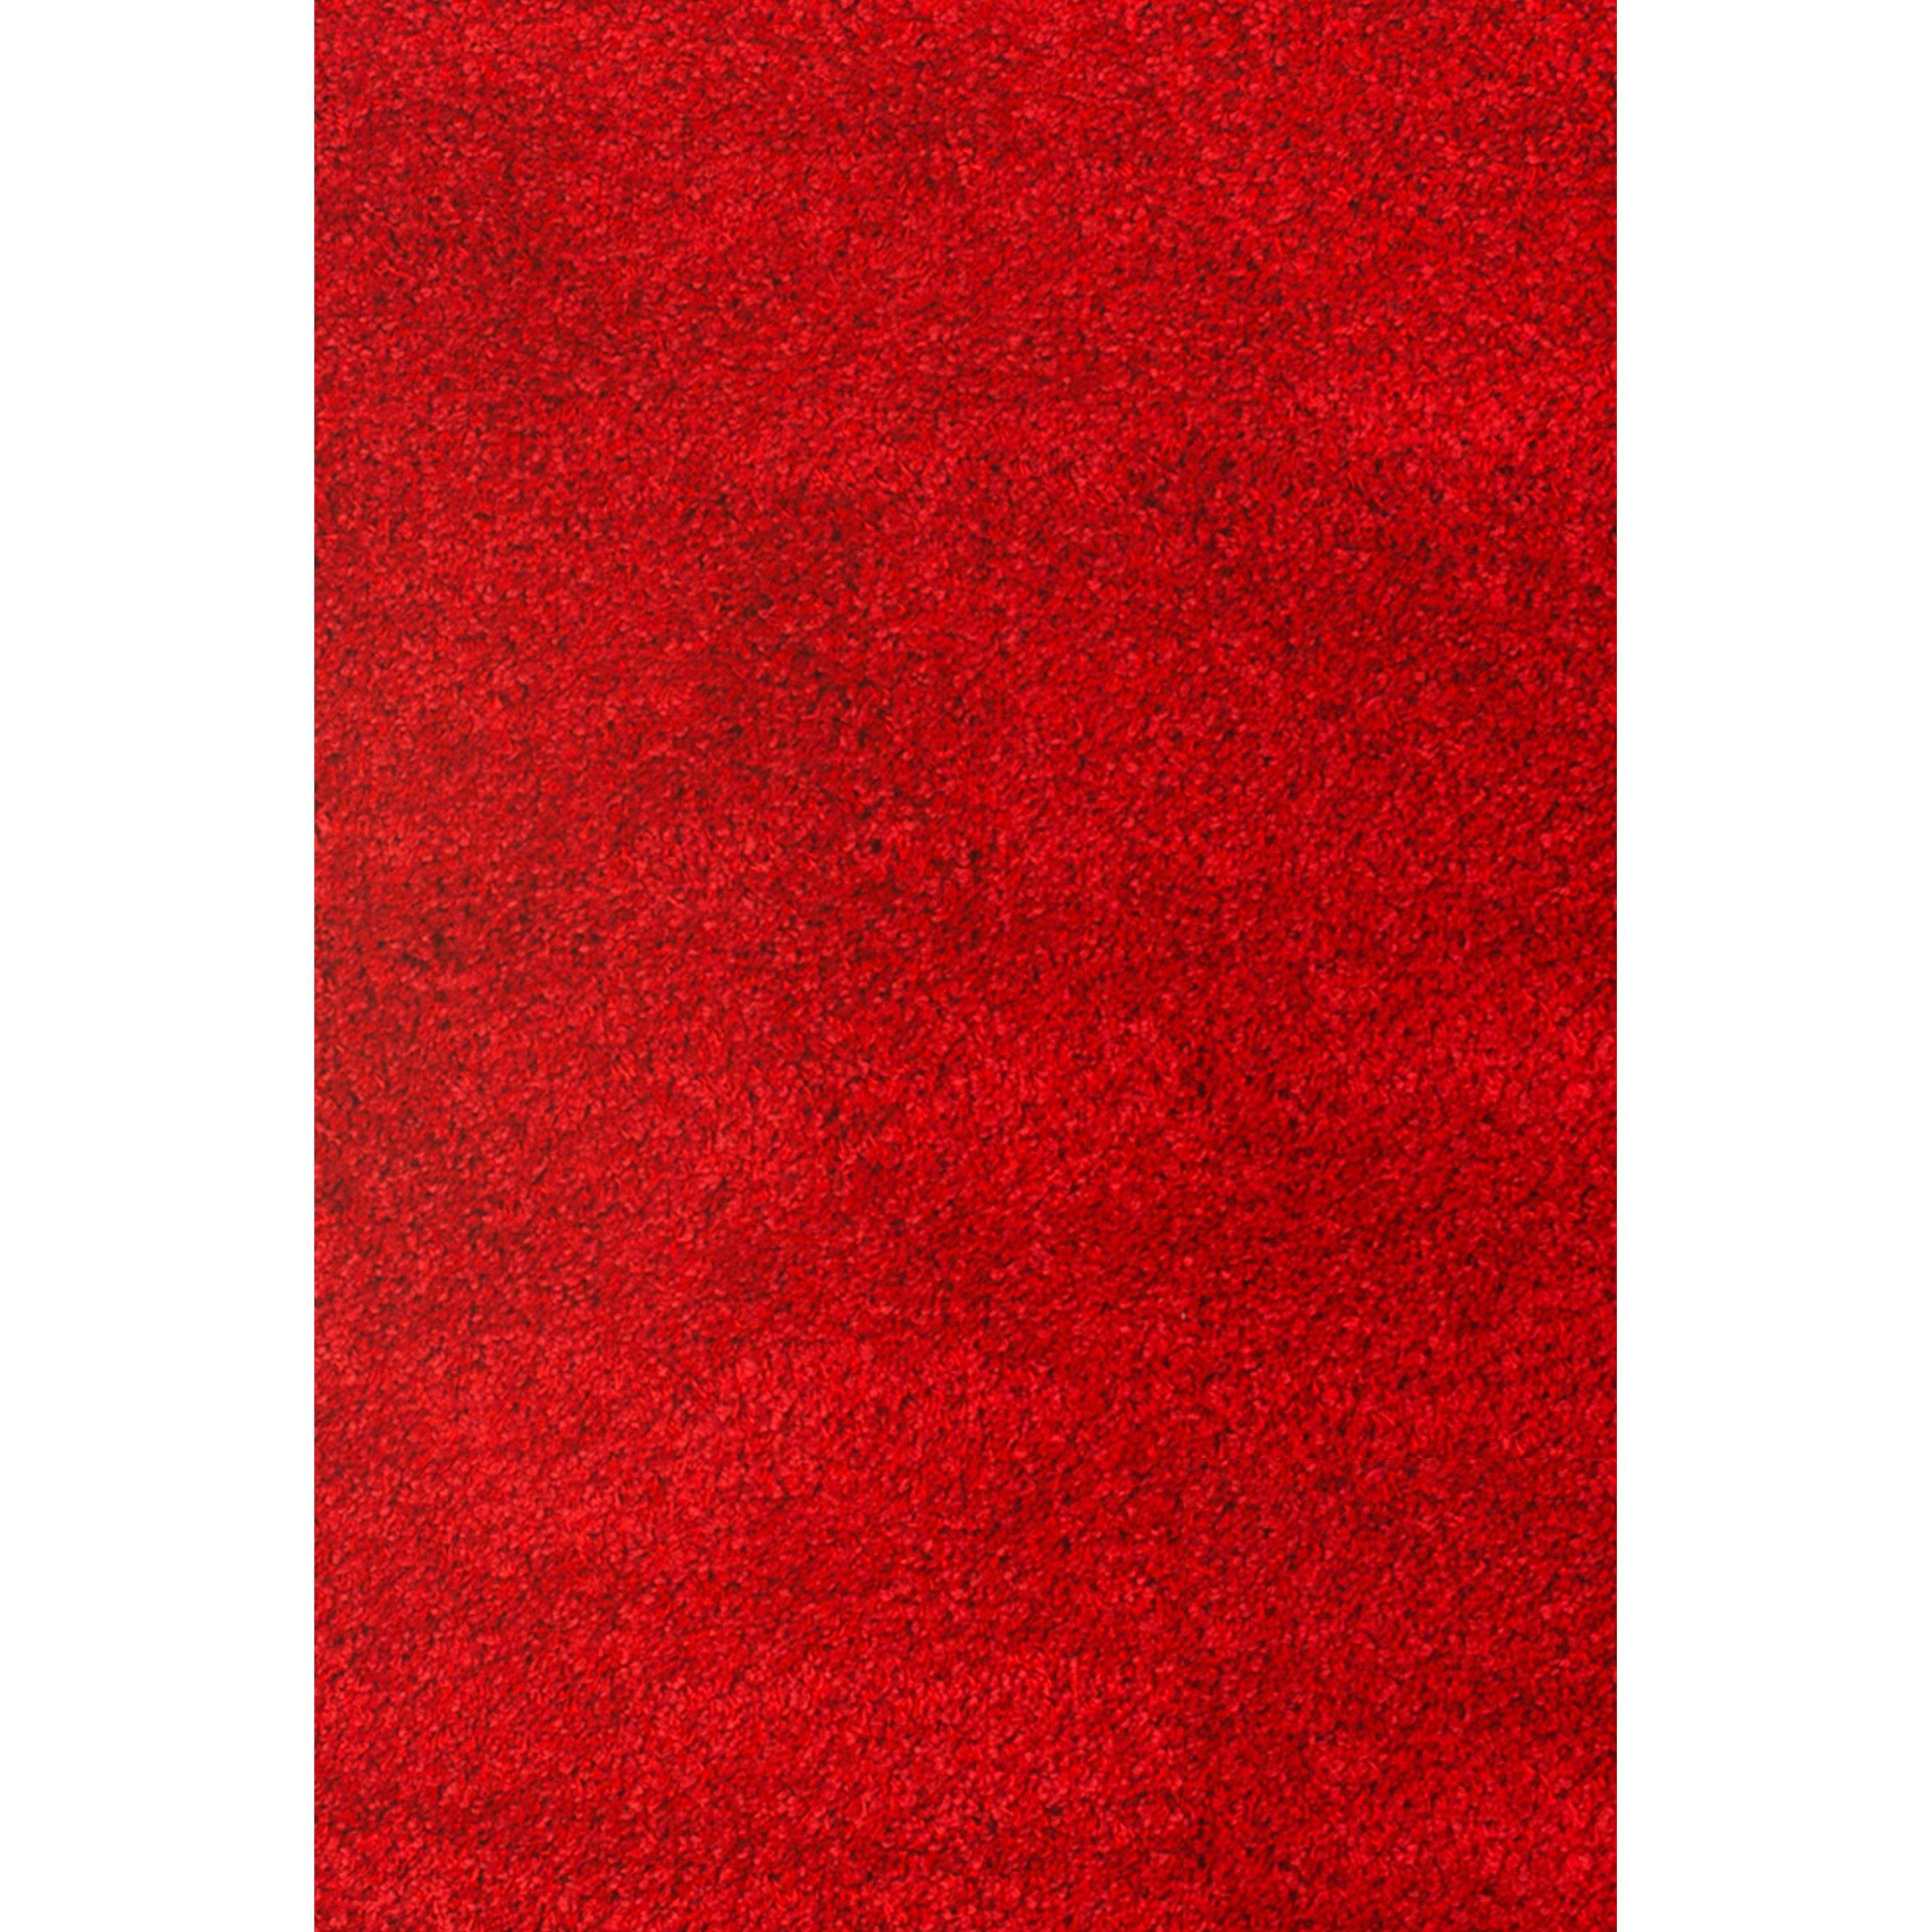 Abacasa Domino Teal Area Rug Reviews: Comfort Shag Red Area Rug